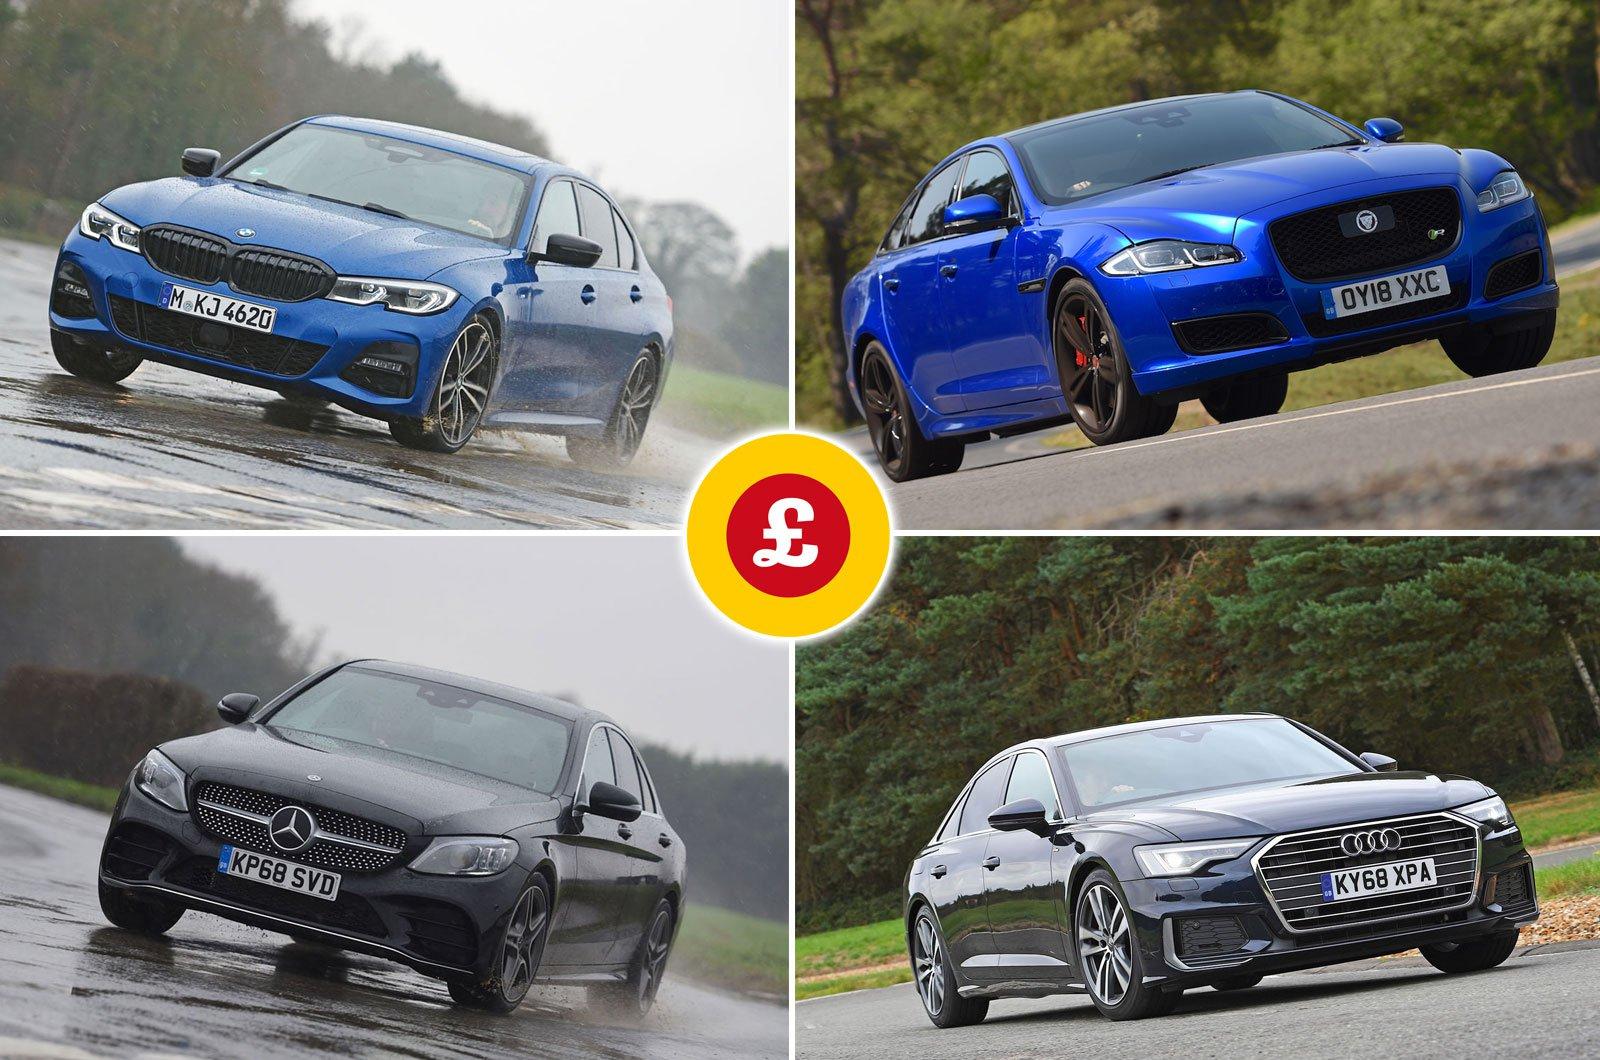 BMW 3 Series, Jaguar XJ, Audi A6, Mercedes C-Class